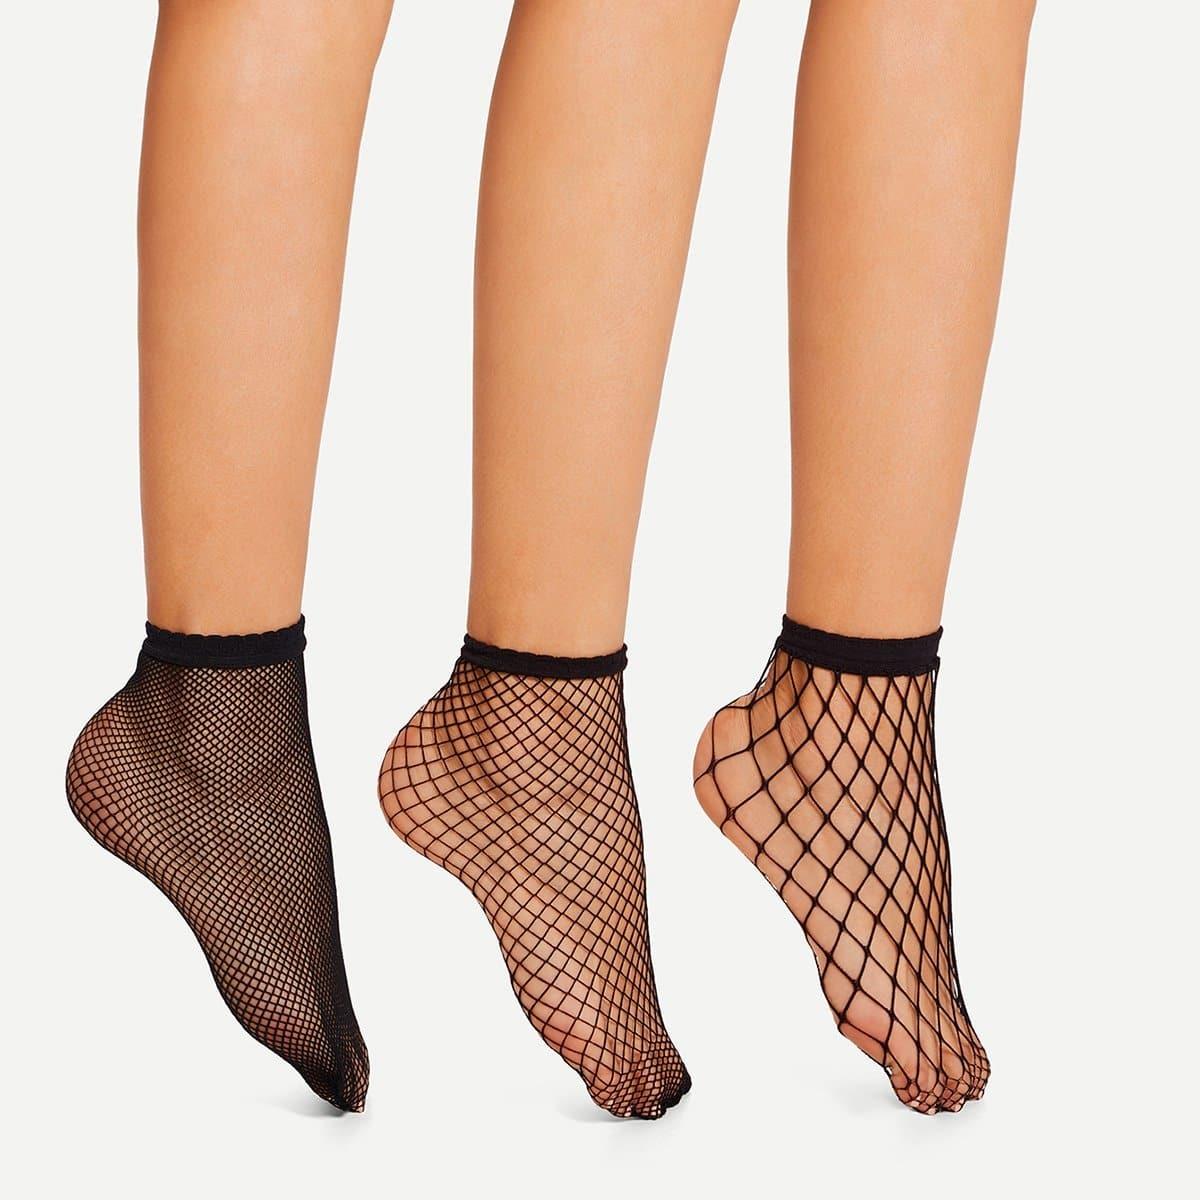 Visnet sokken - 3 paar